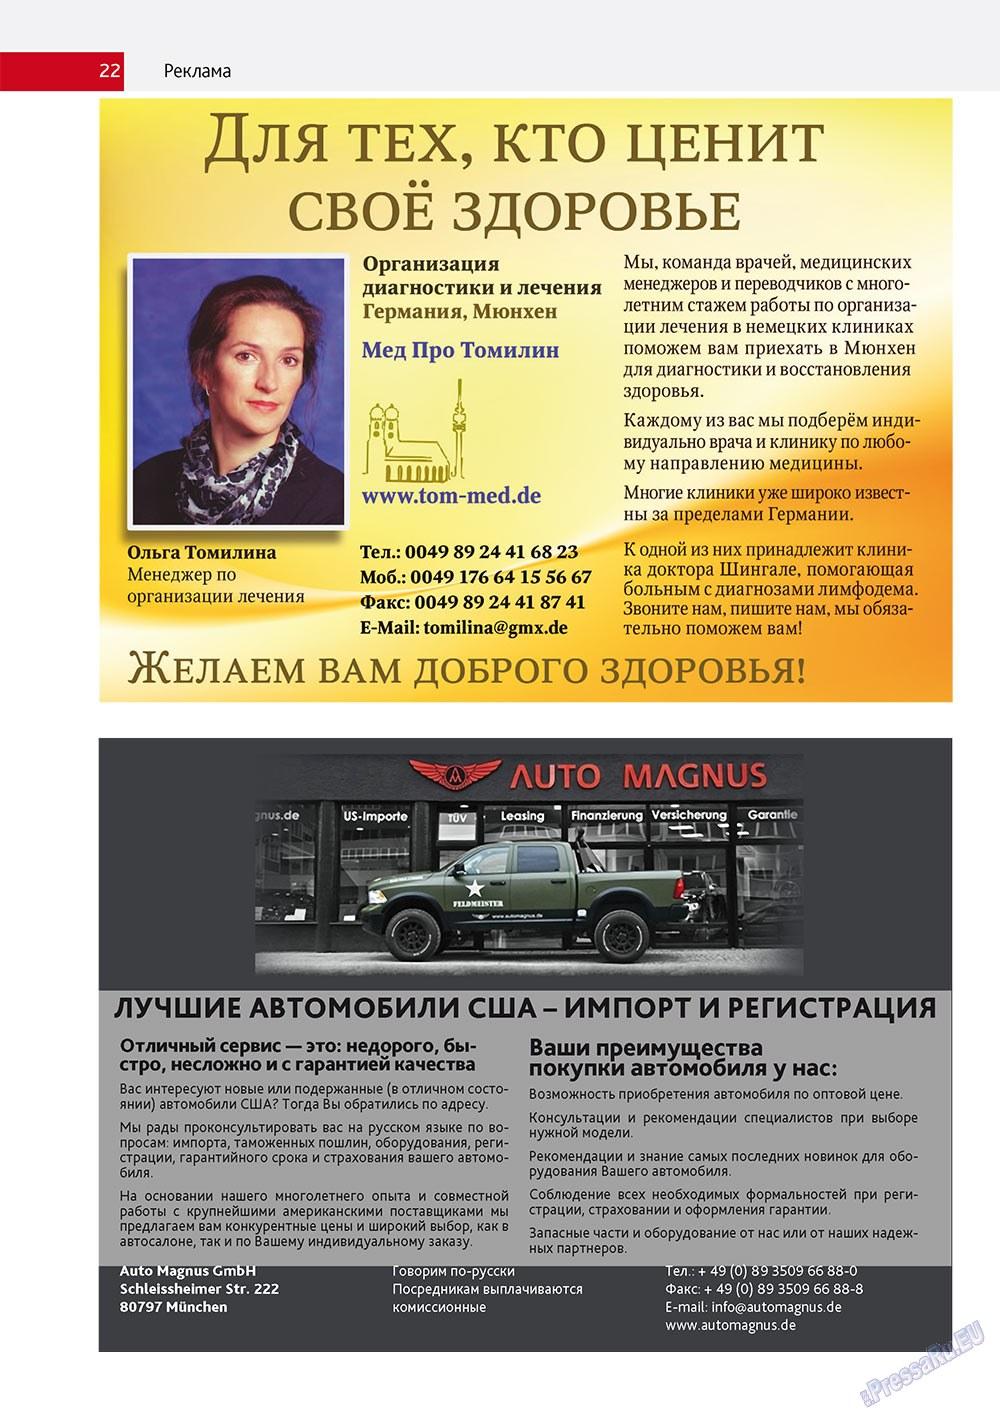 Бизнес парк (журнал). 2011 год, номер 4, стр. 22